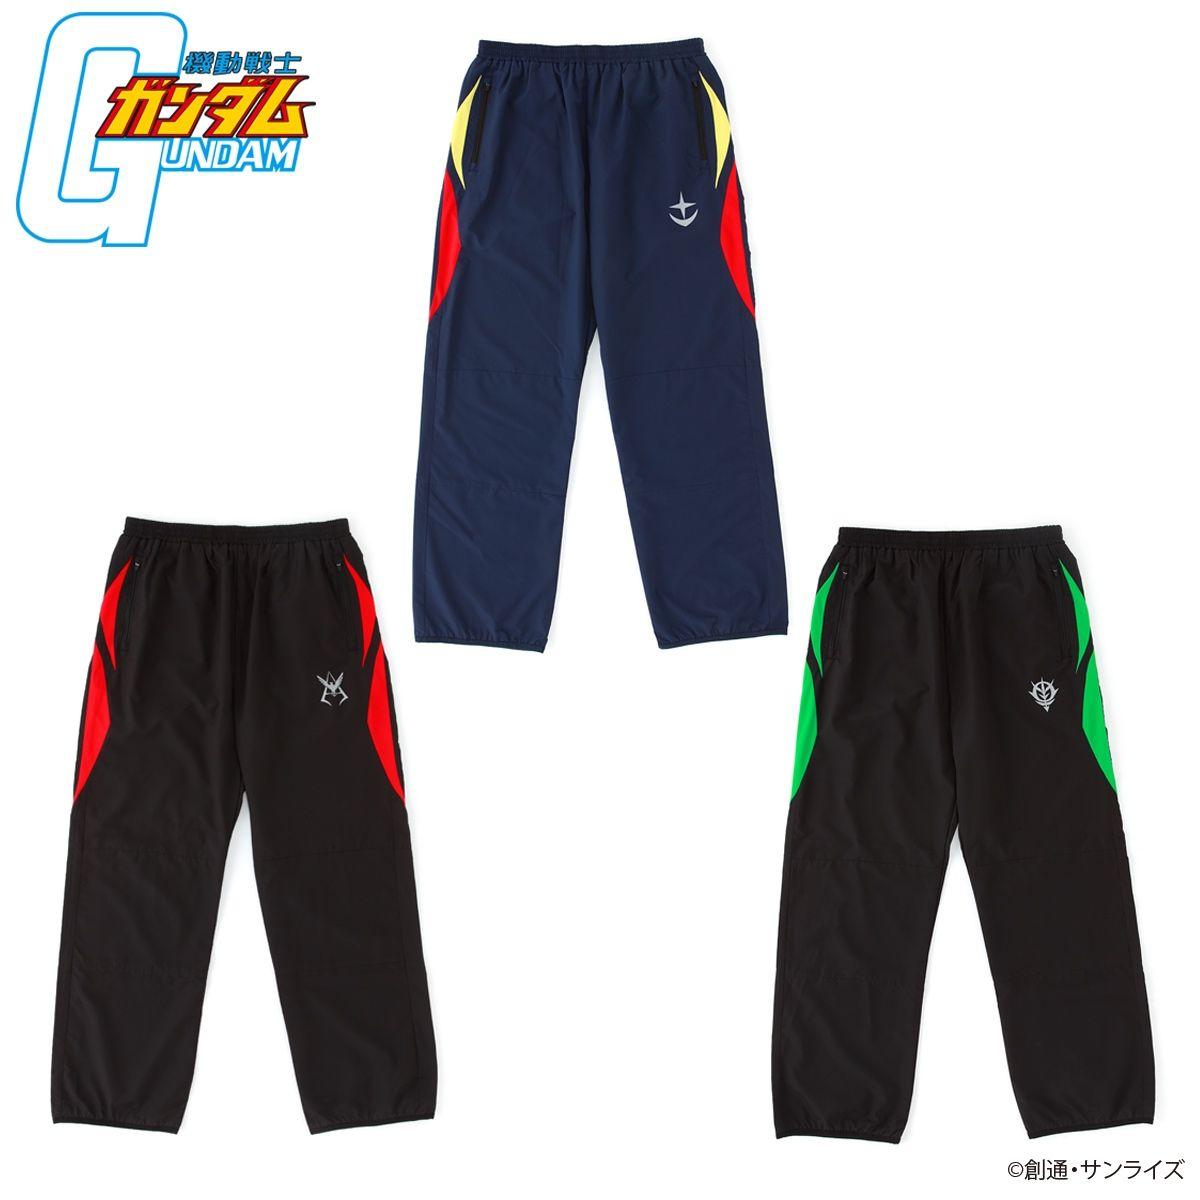 Mobile Suit Gundam Sportswear - Sweatpants